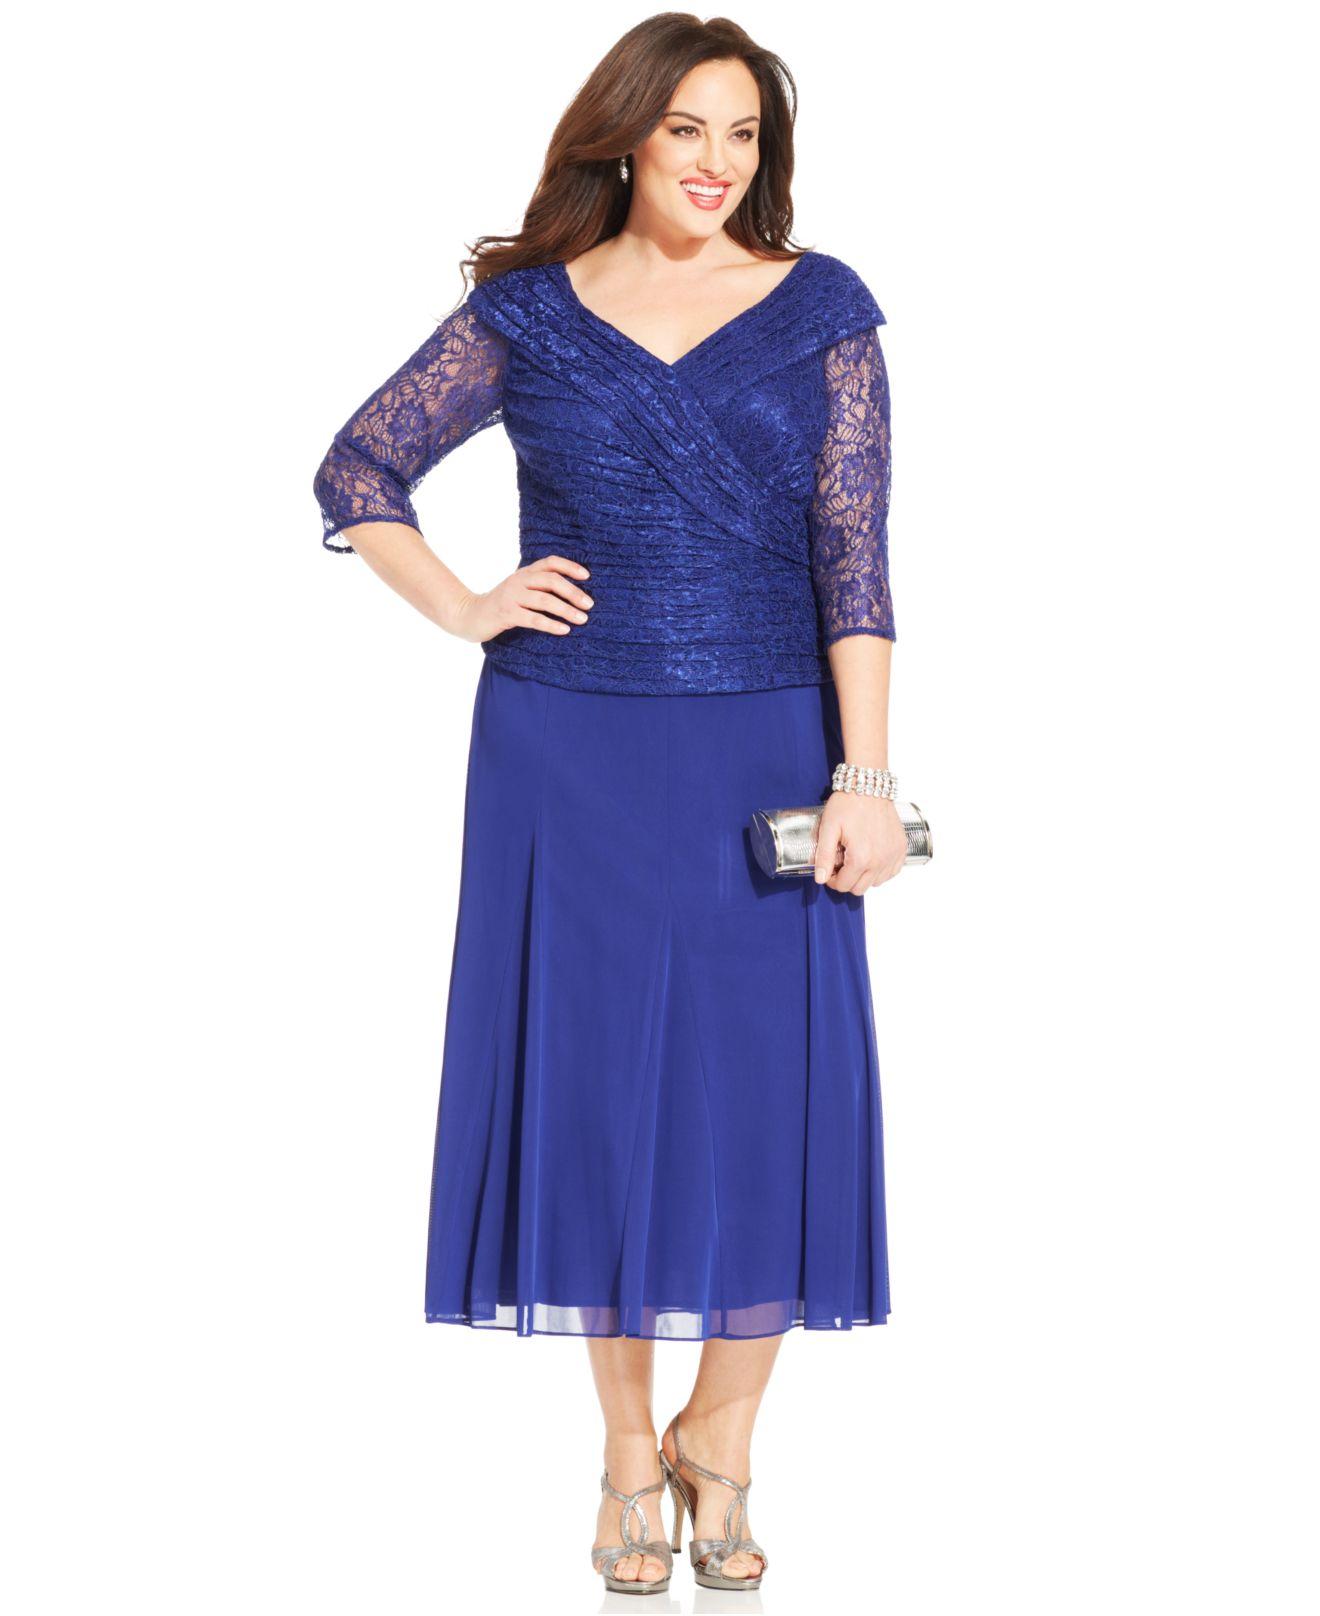 5cd29c00adae Alex Evenings Plus Size Lace Portrait-Collar Dress in Blue - Lyst